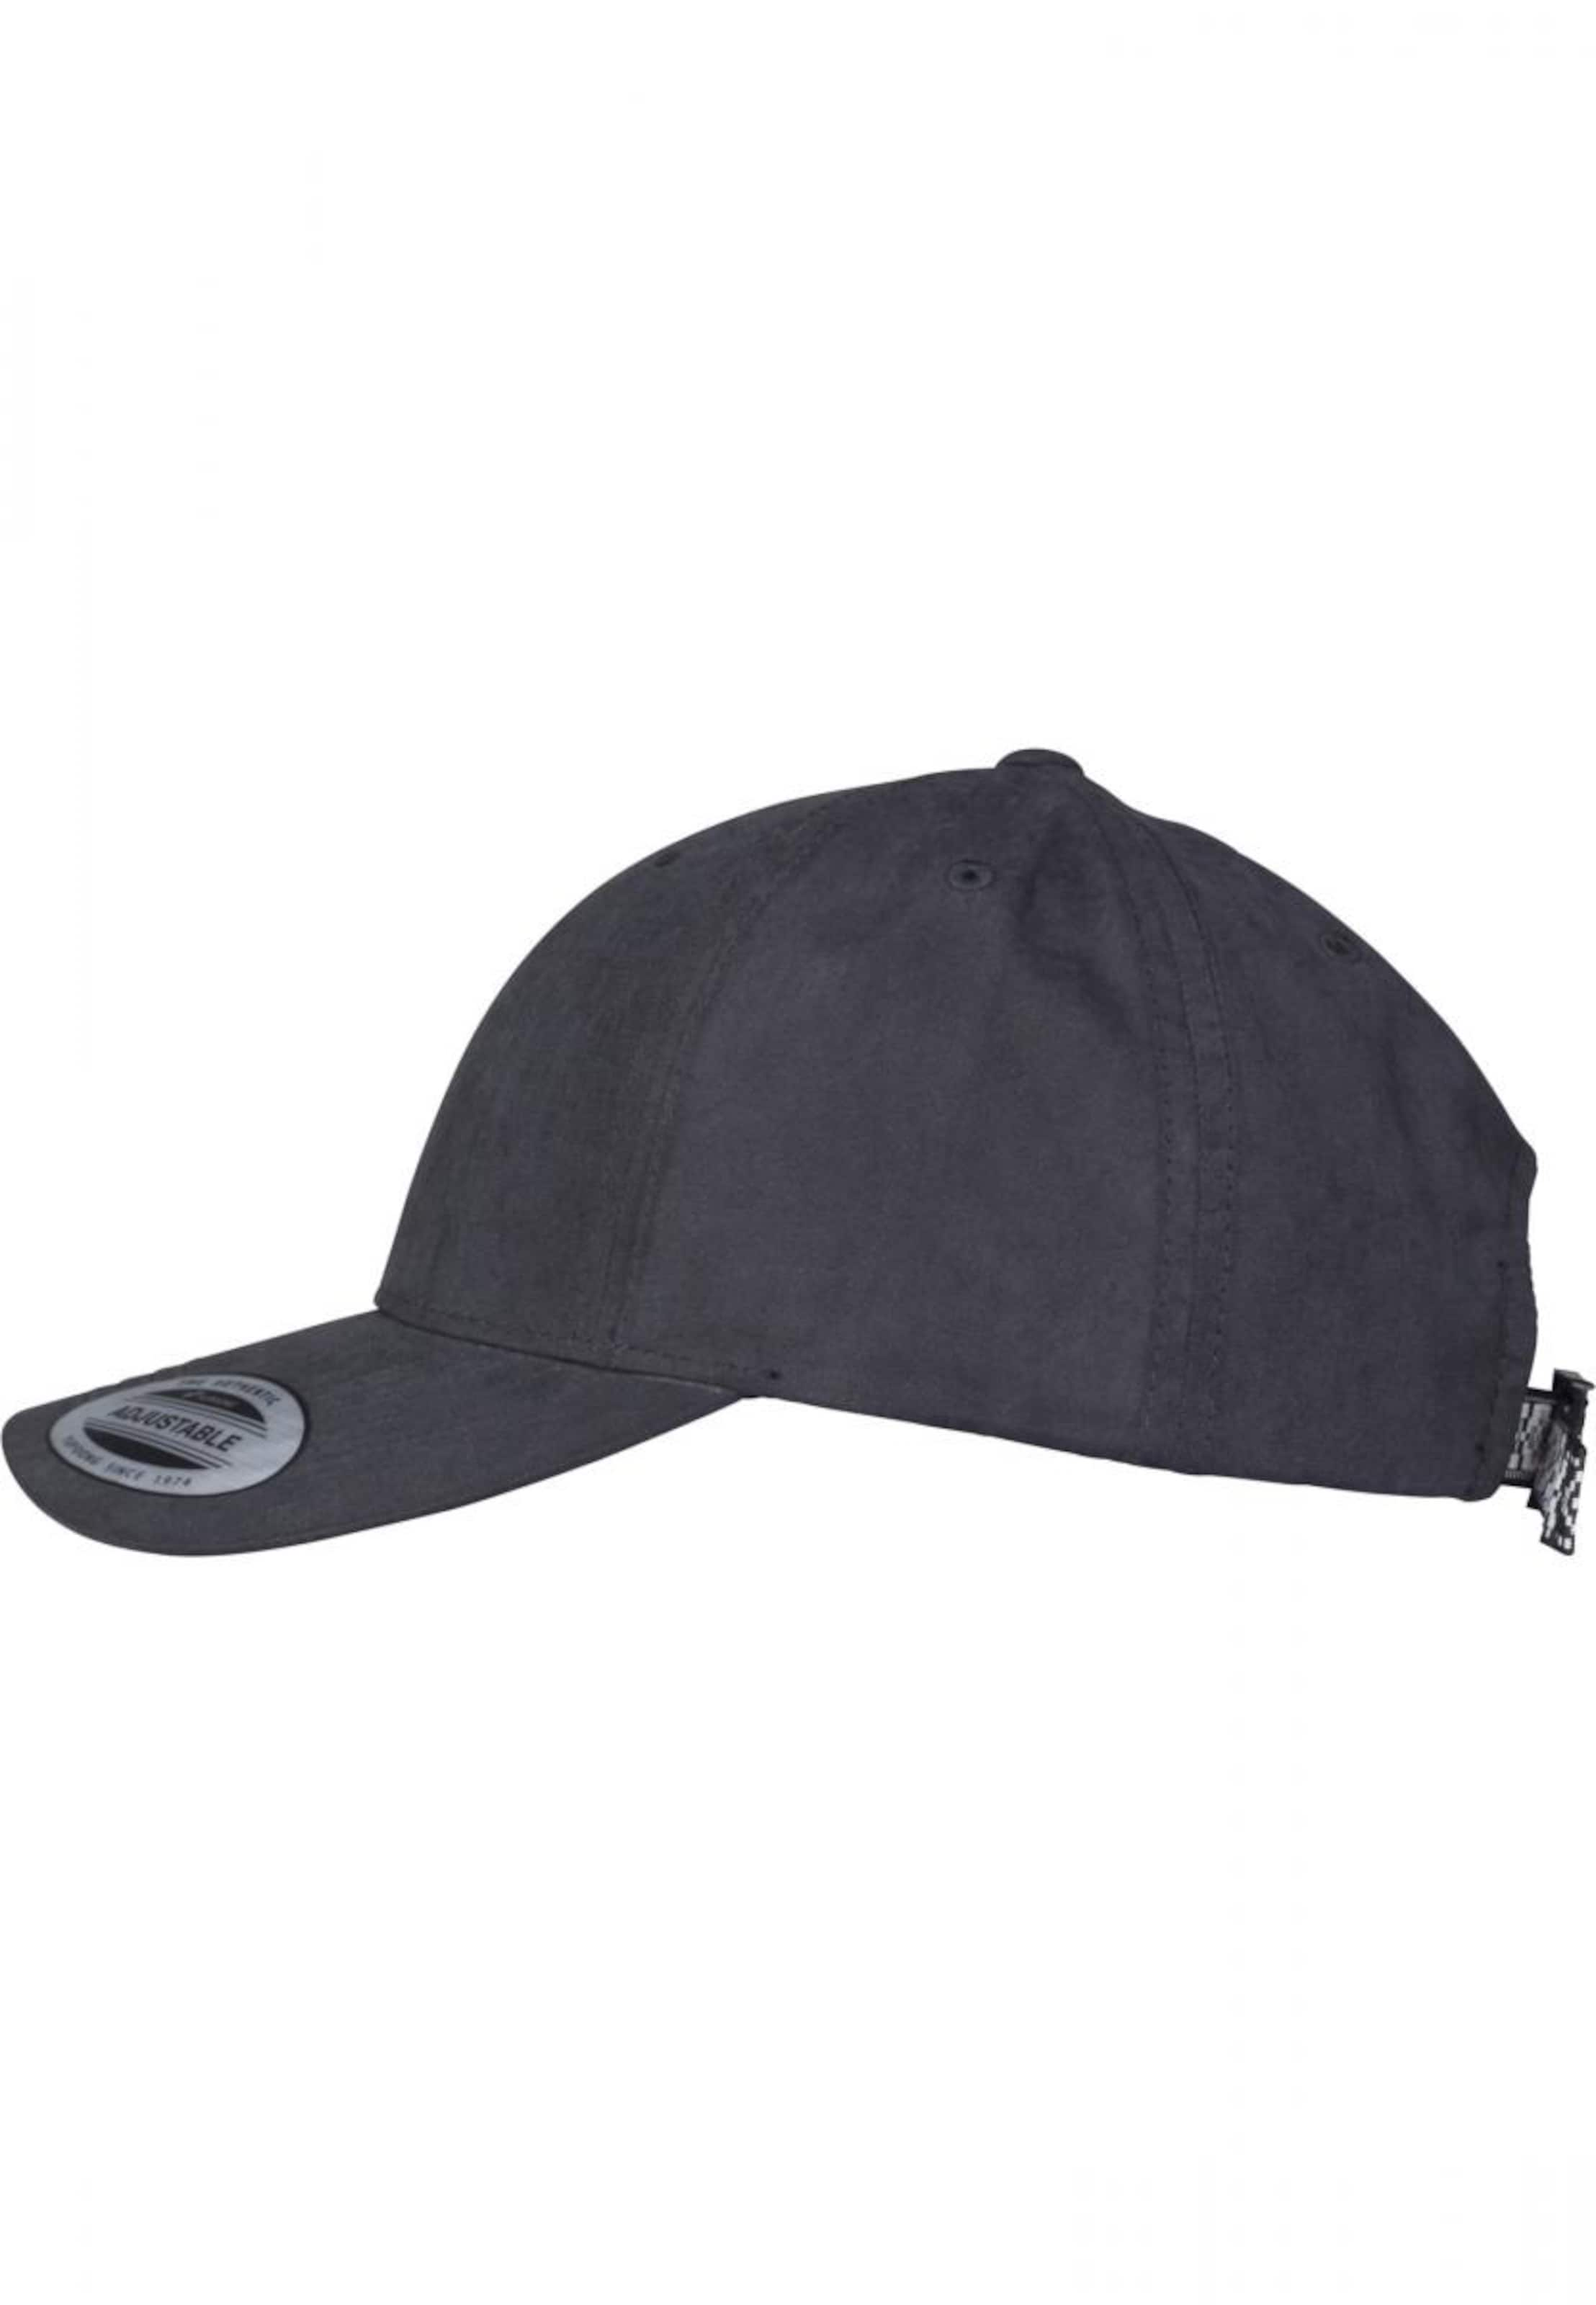 Strap' 'ethno Flexfit Cap In Schwarz K1cTlFJ3u5